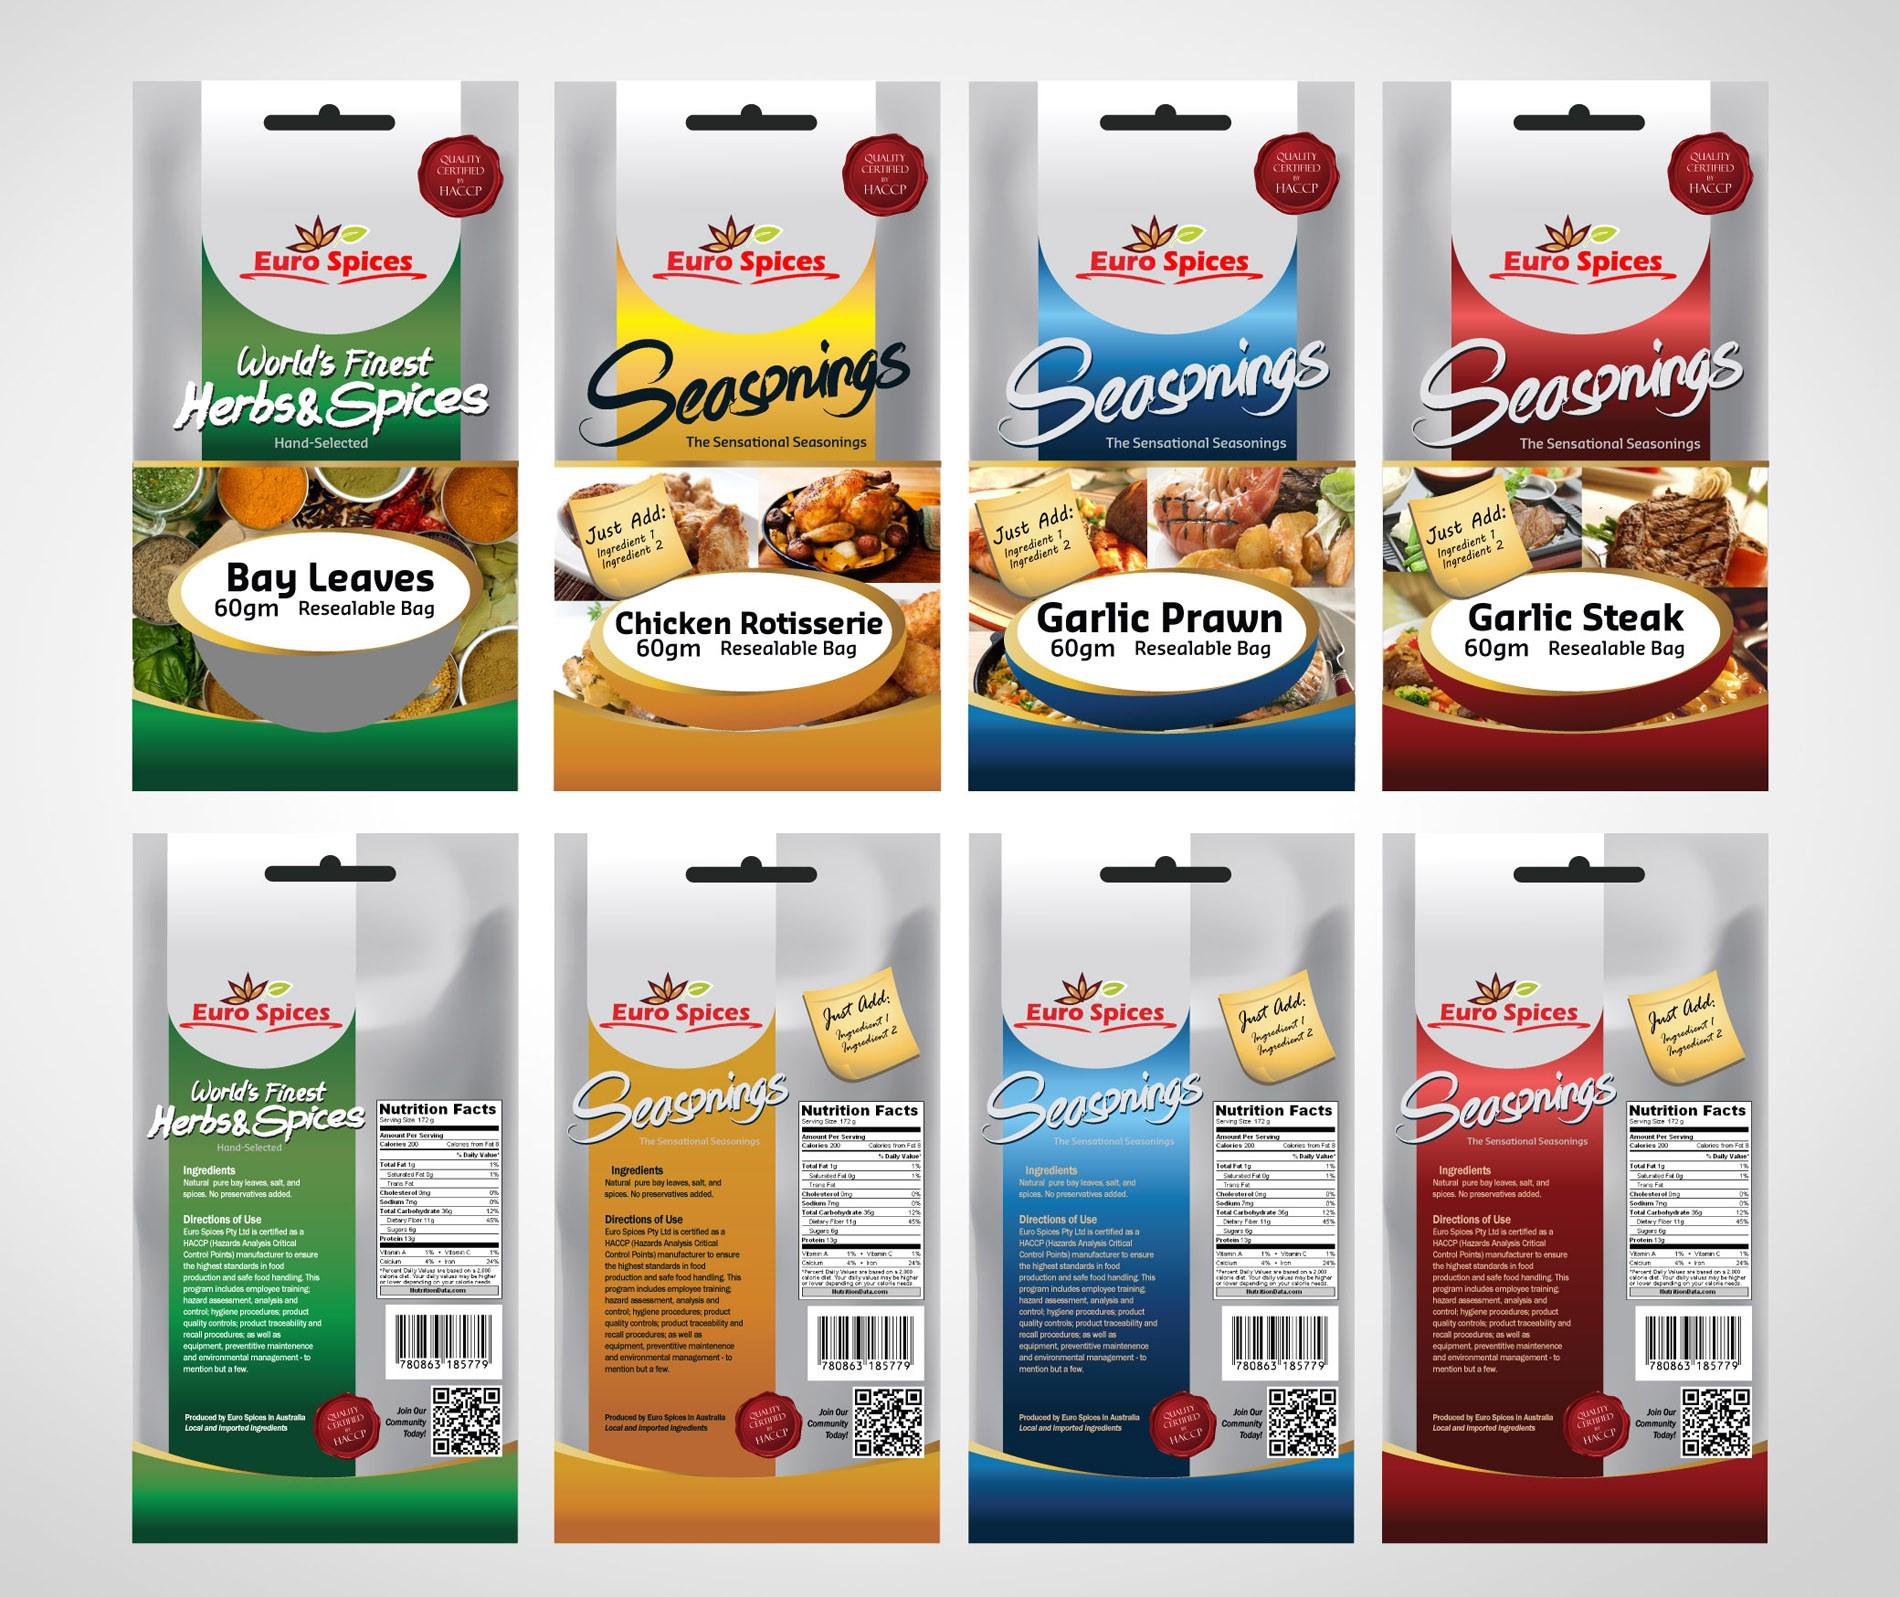 Euro Spices Large packaging design - LARGE BONUS FOR WINNING DESIGN